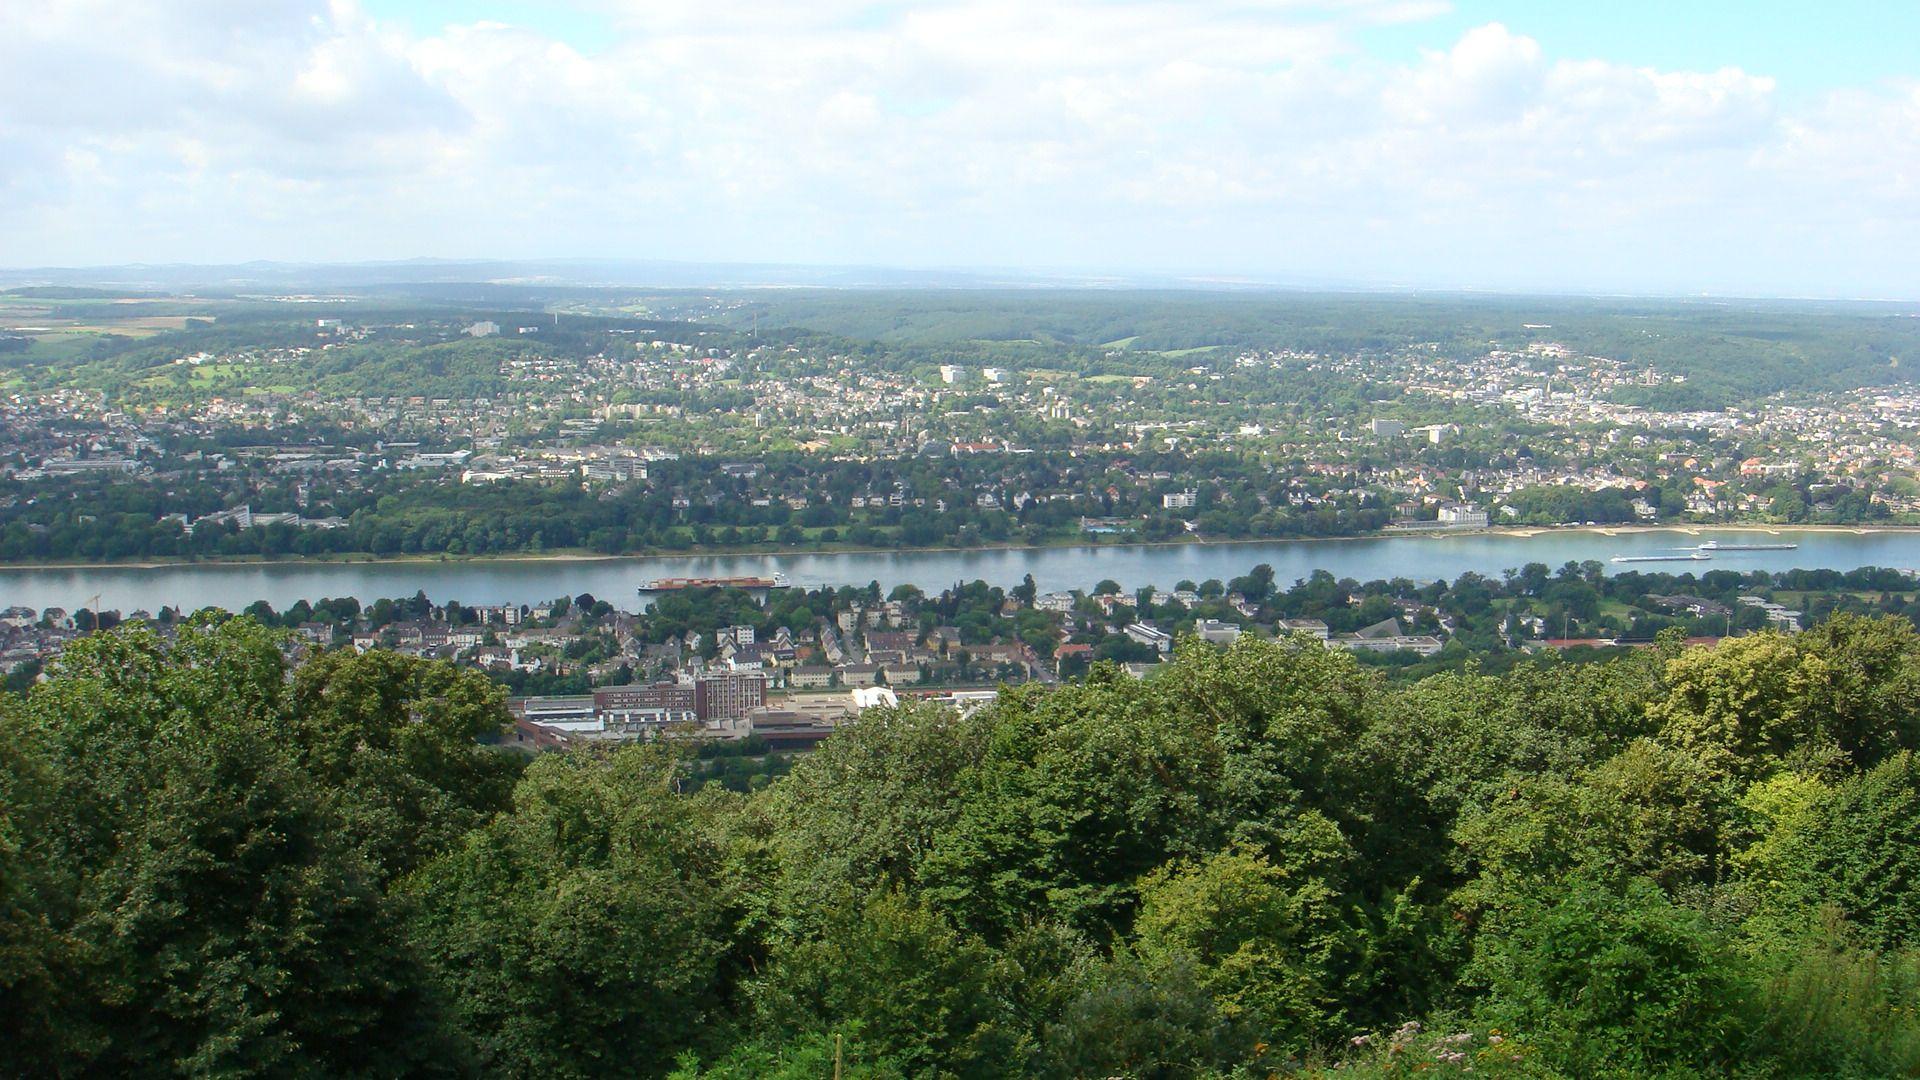 View Of The Rhine River And Bonn Bad Godesberg From The Steigenberger Grandhotel Petersberg Germany Joe Cruz Photo Bonn